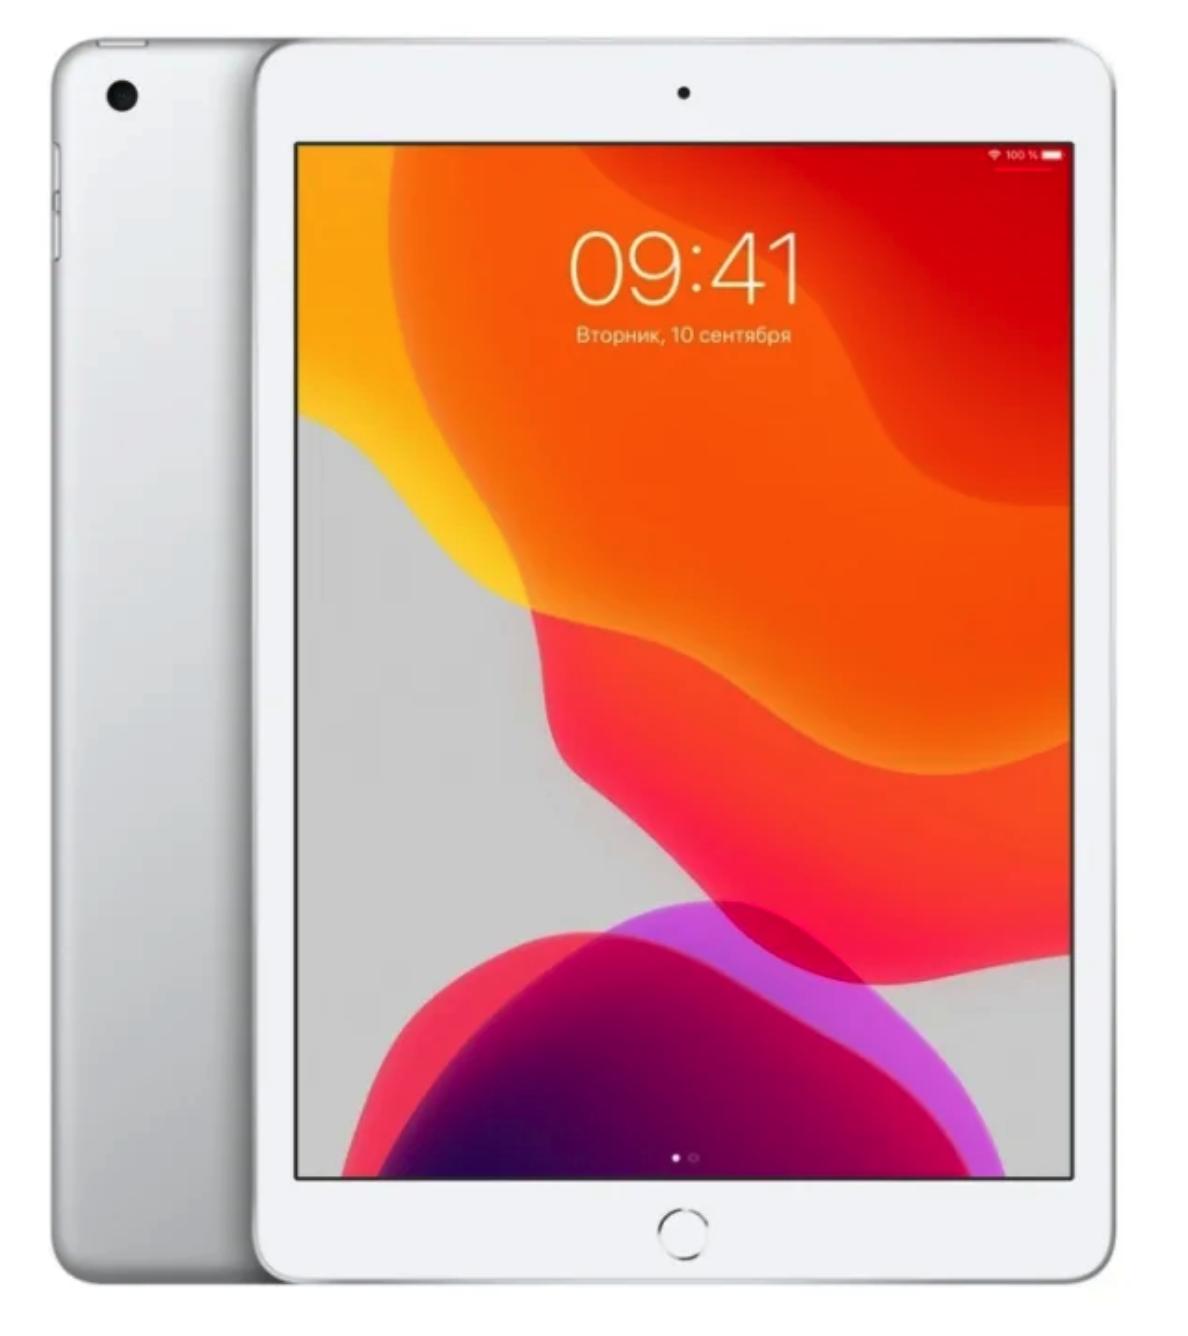 Планшет Apple iPad (2019) 32Gb Wi-Fi Silver (серебристый) MW752RU/A РОСТЕСТ